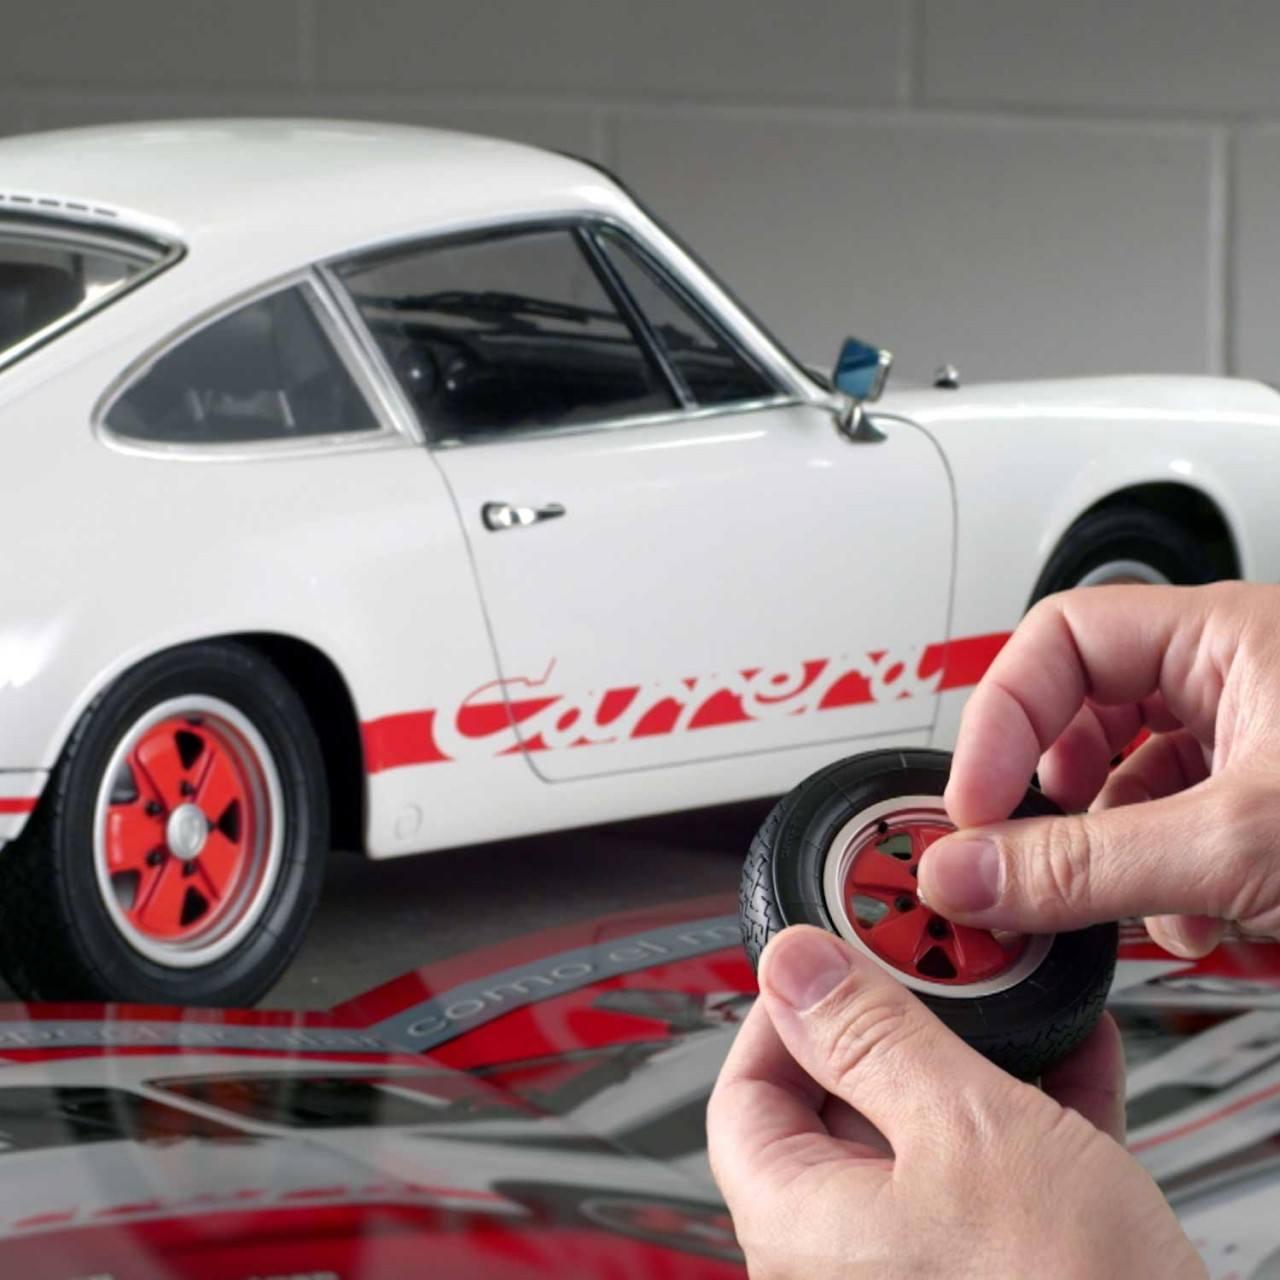 Build Your Own Porsche >> Build Model Porsche 911 Carrera   1:8 Scale   ModelSpace